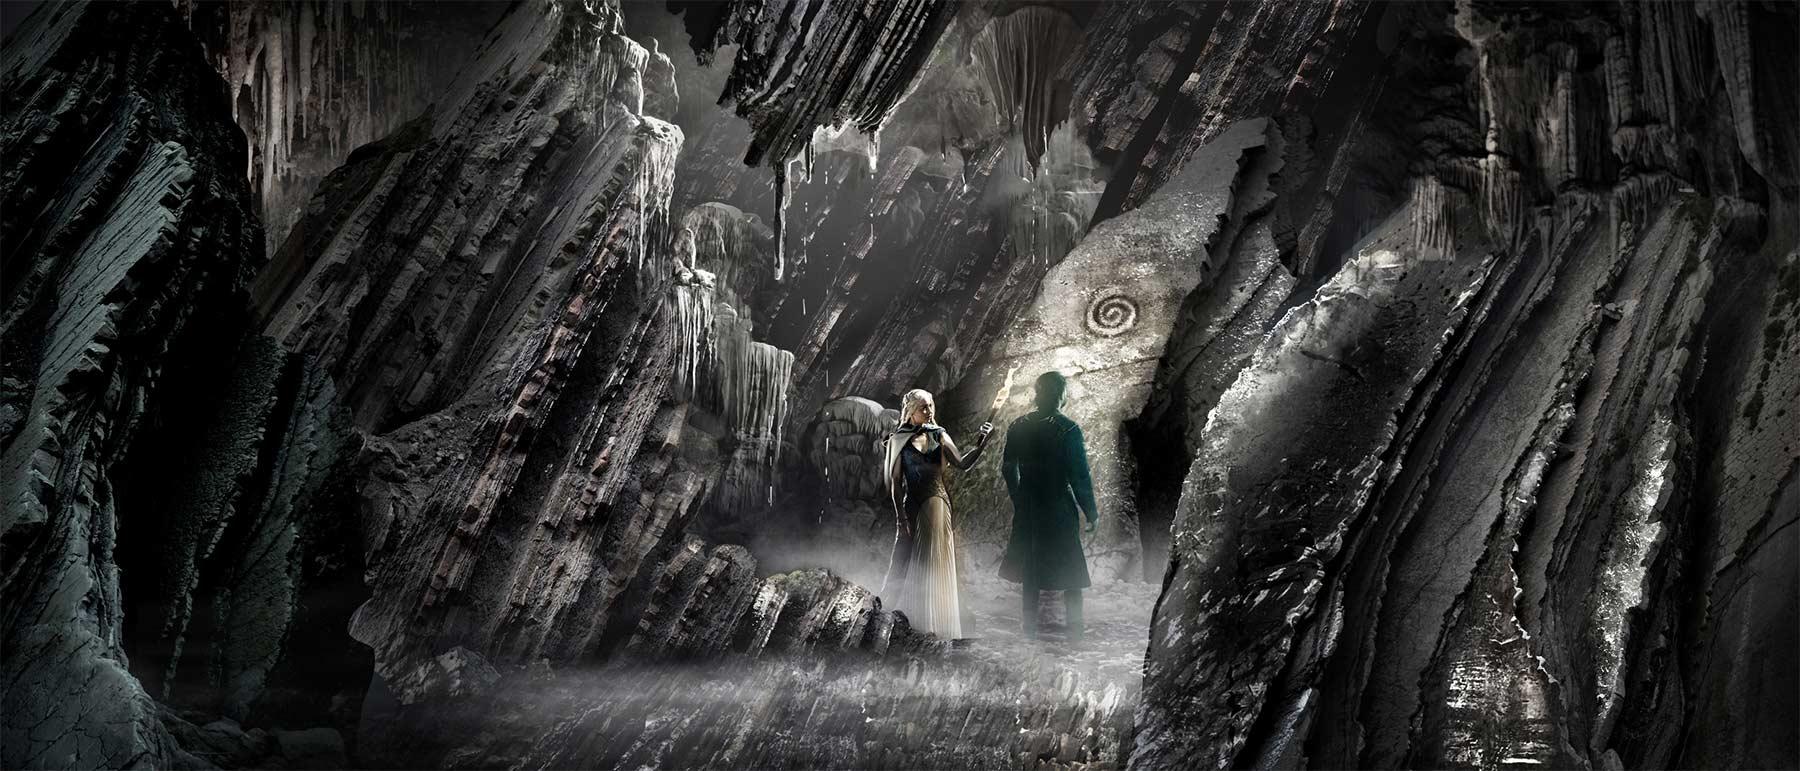 Game of Thrones Staffel 7 Concept Art Kieran-Belshaw-game-of-thrones-concept-art_16